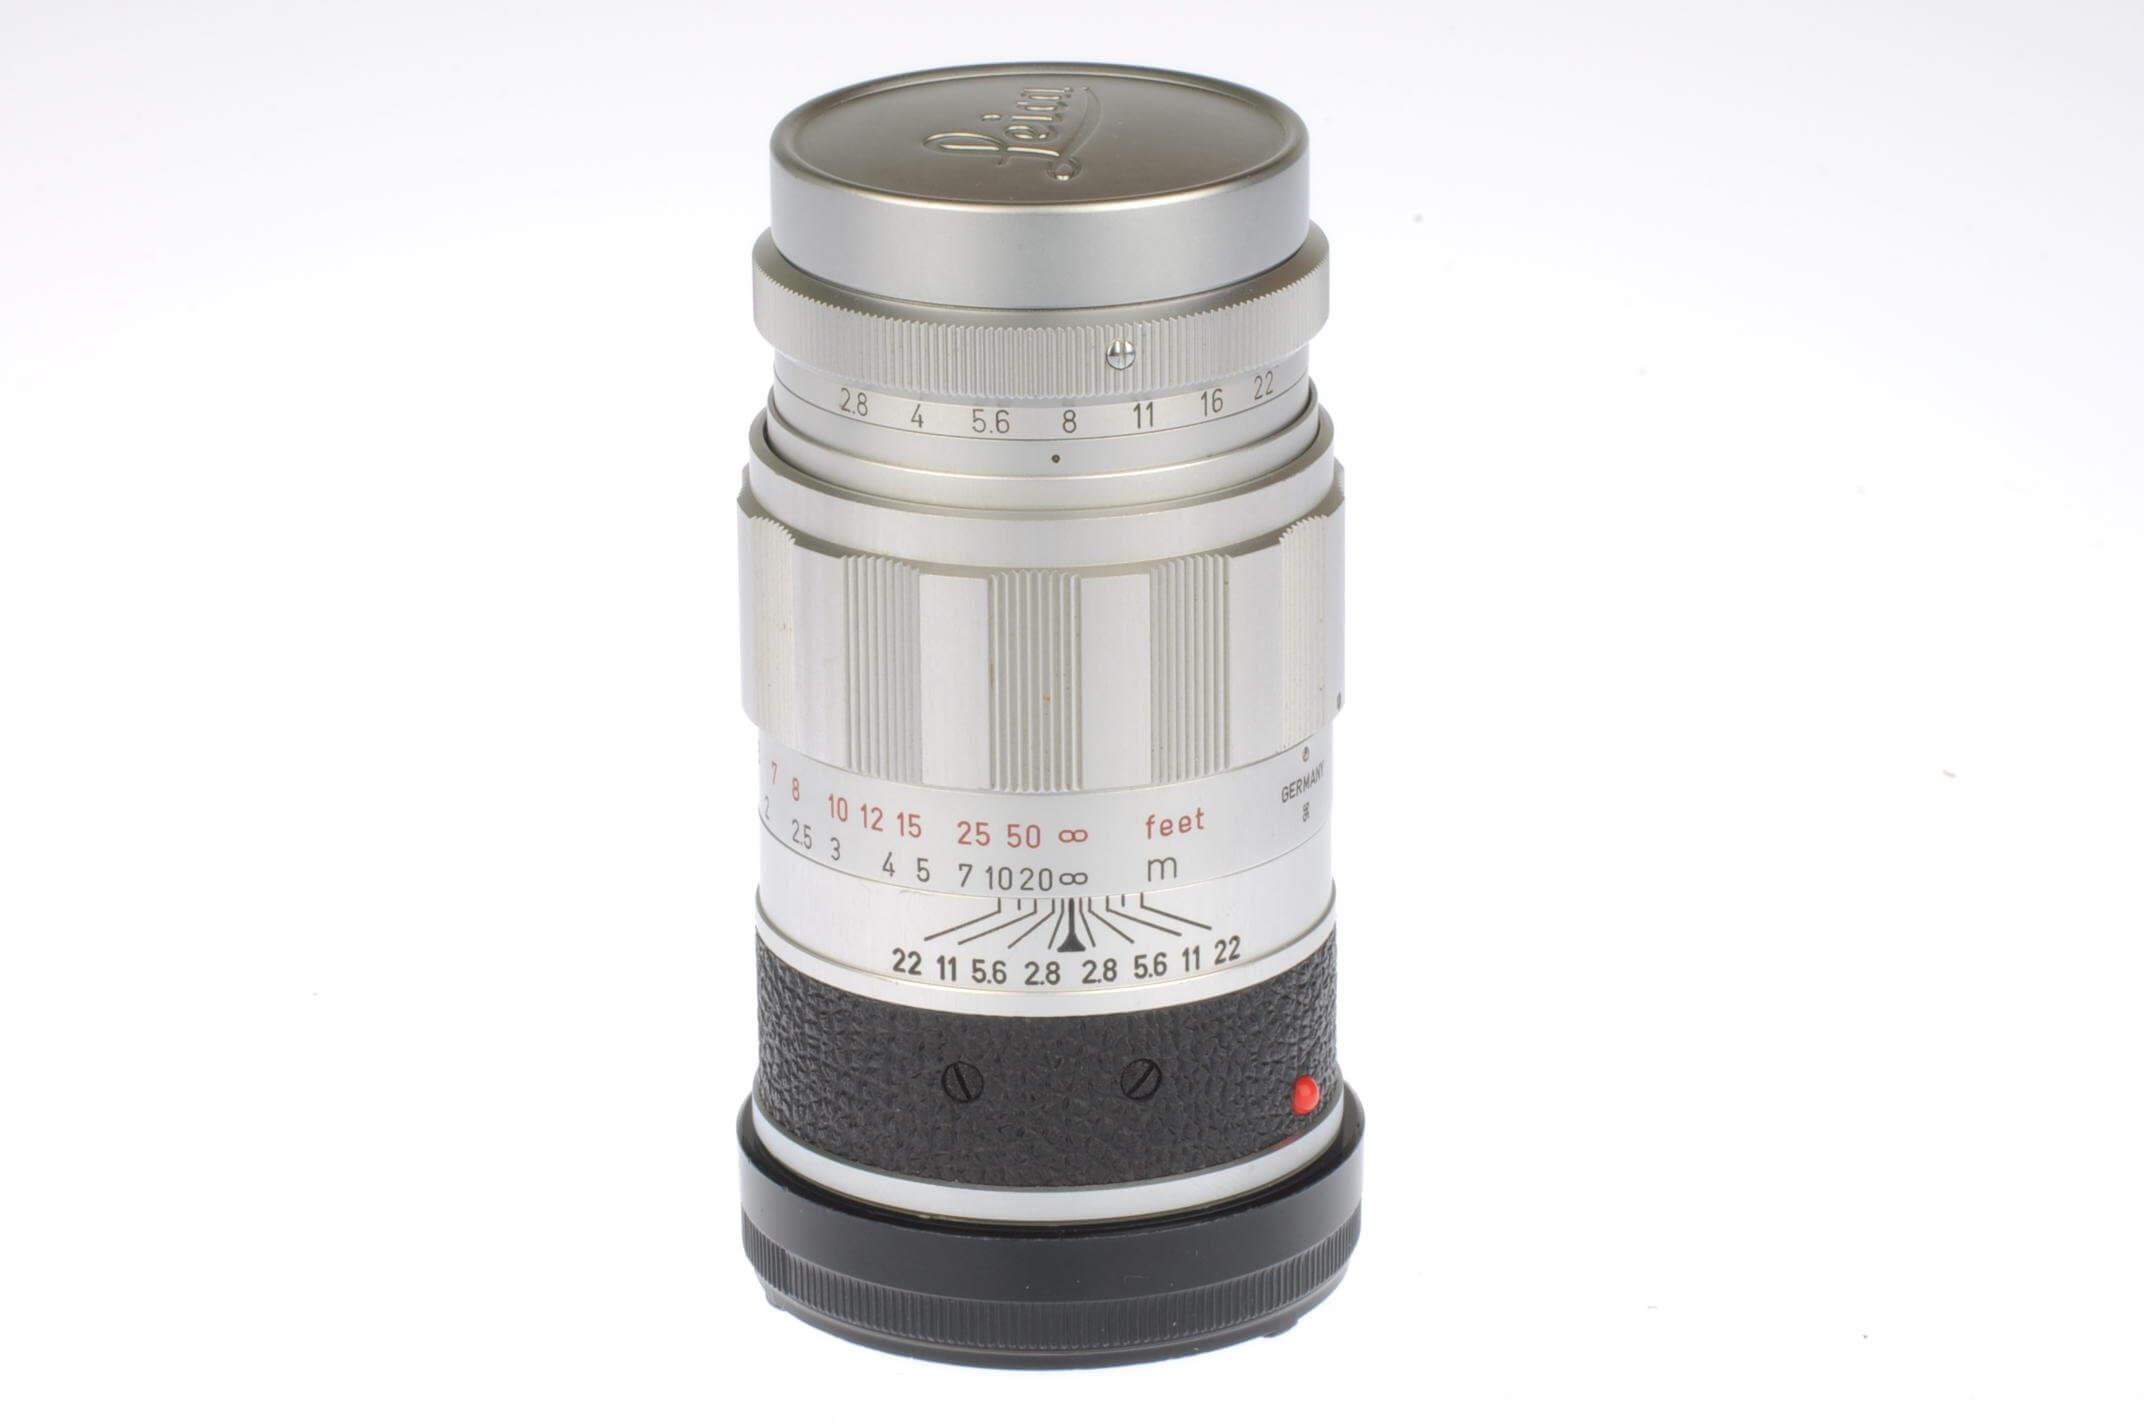 Leica 90mm f2.8 Elmarit, exceptional condition!